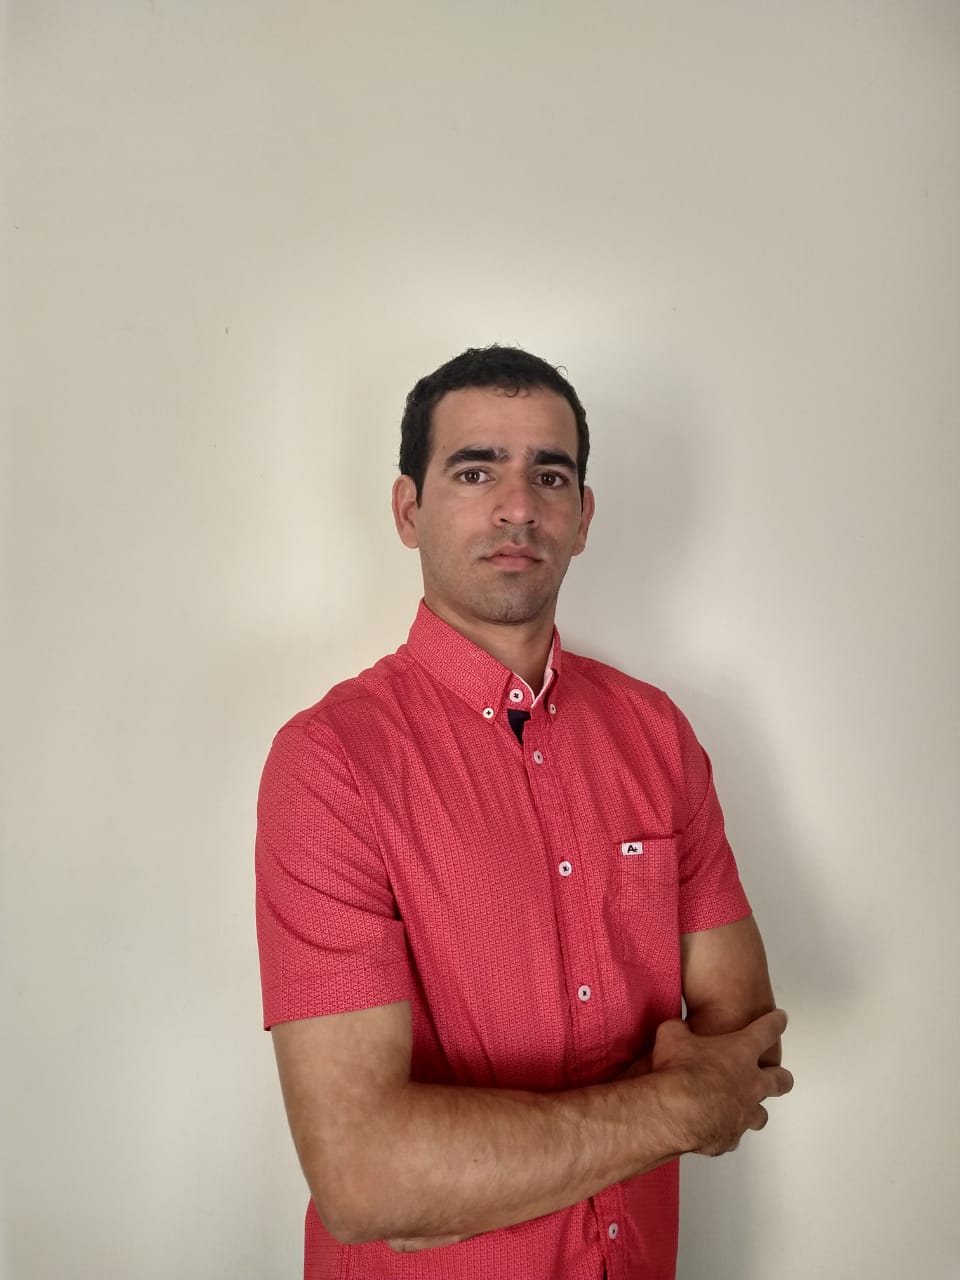 Diego Armando Céspedes Álvarez